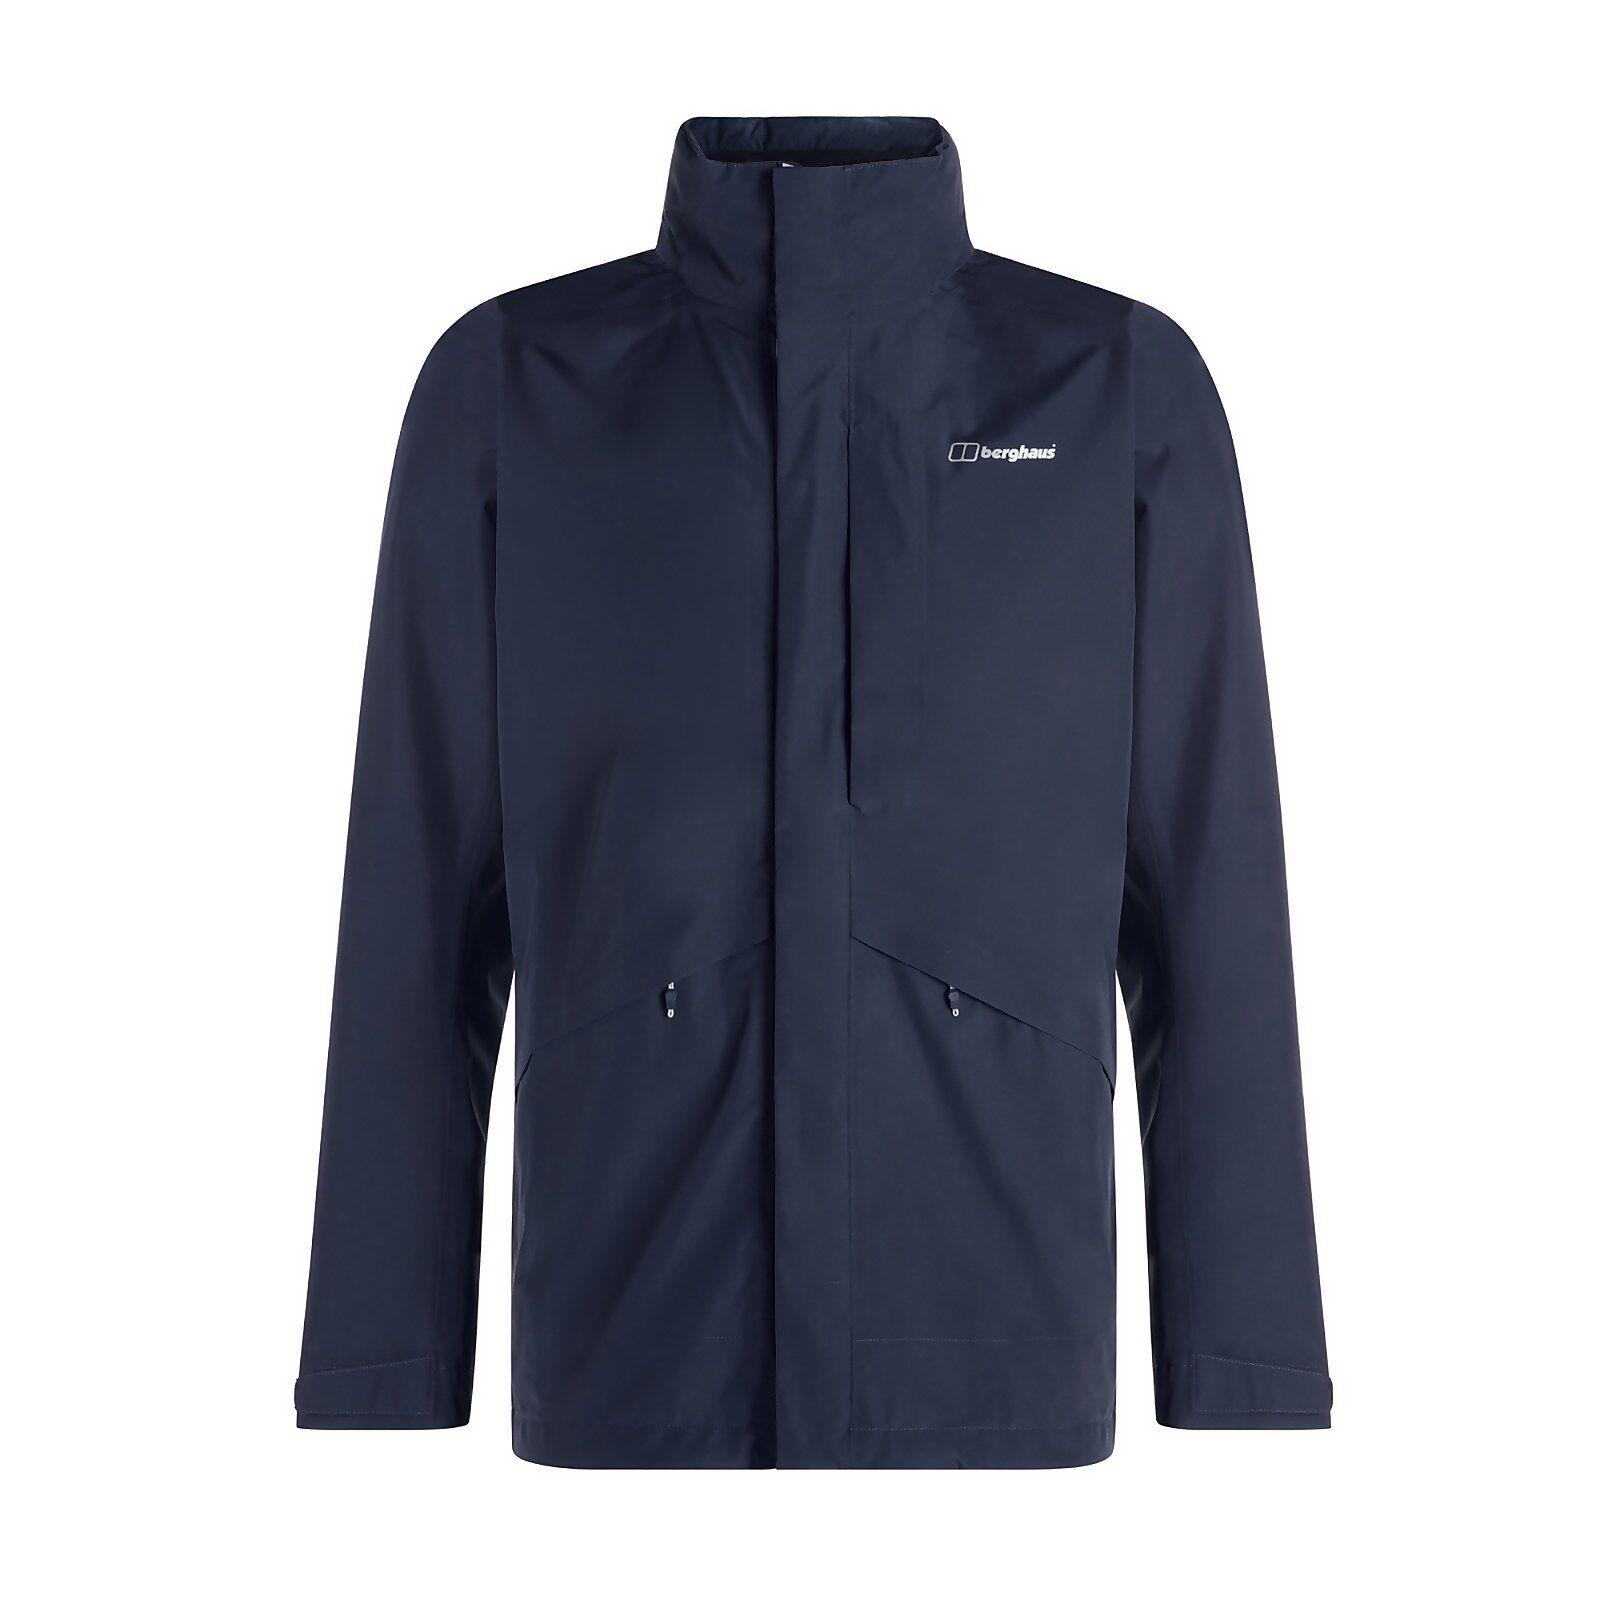 Berghaus Men's Highland Ridge Interactive Jacket - Blue - 3XL  - Blue - Size: 3X-Large